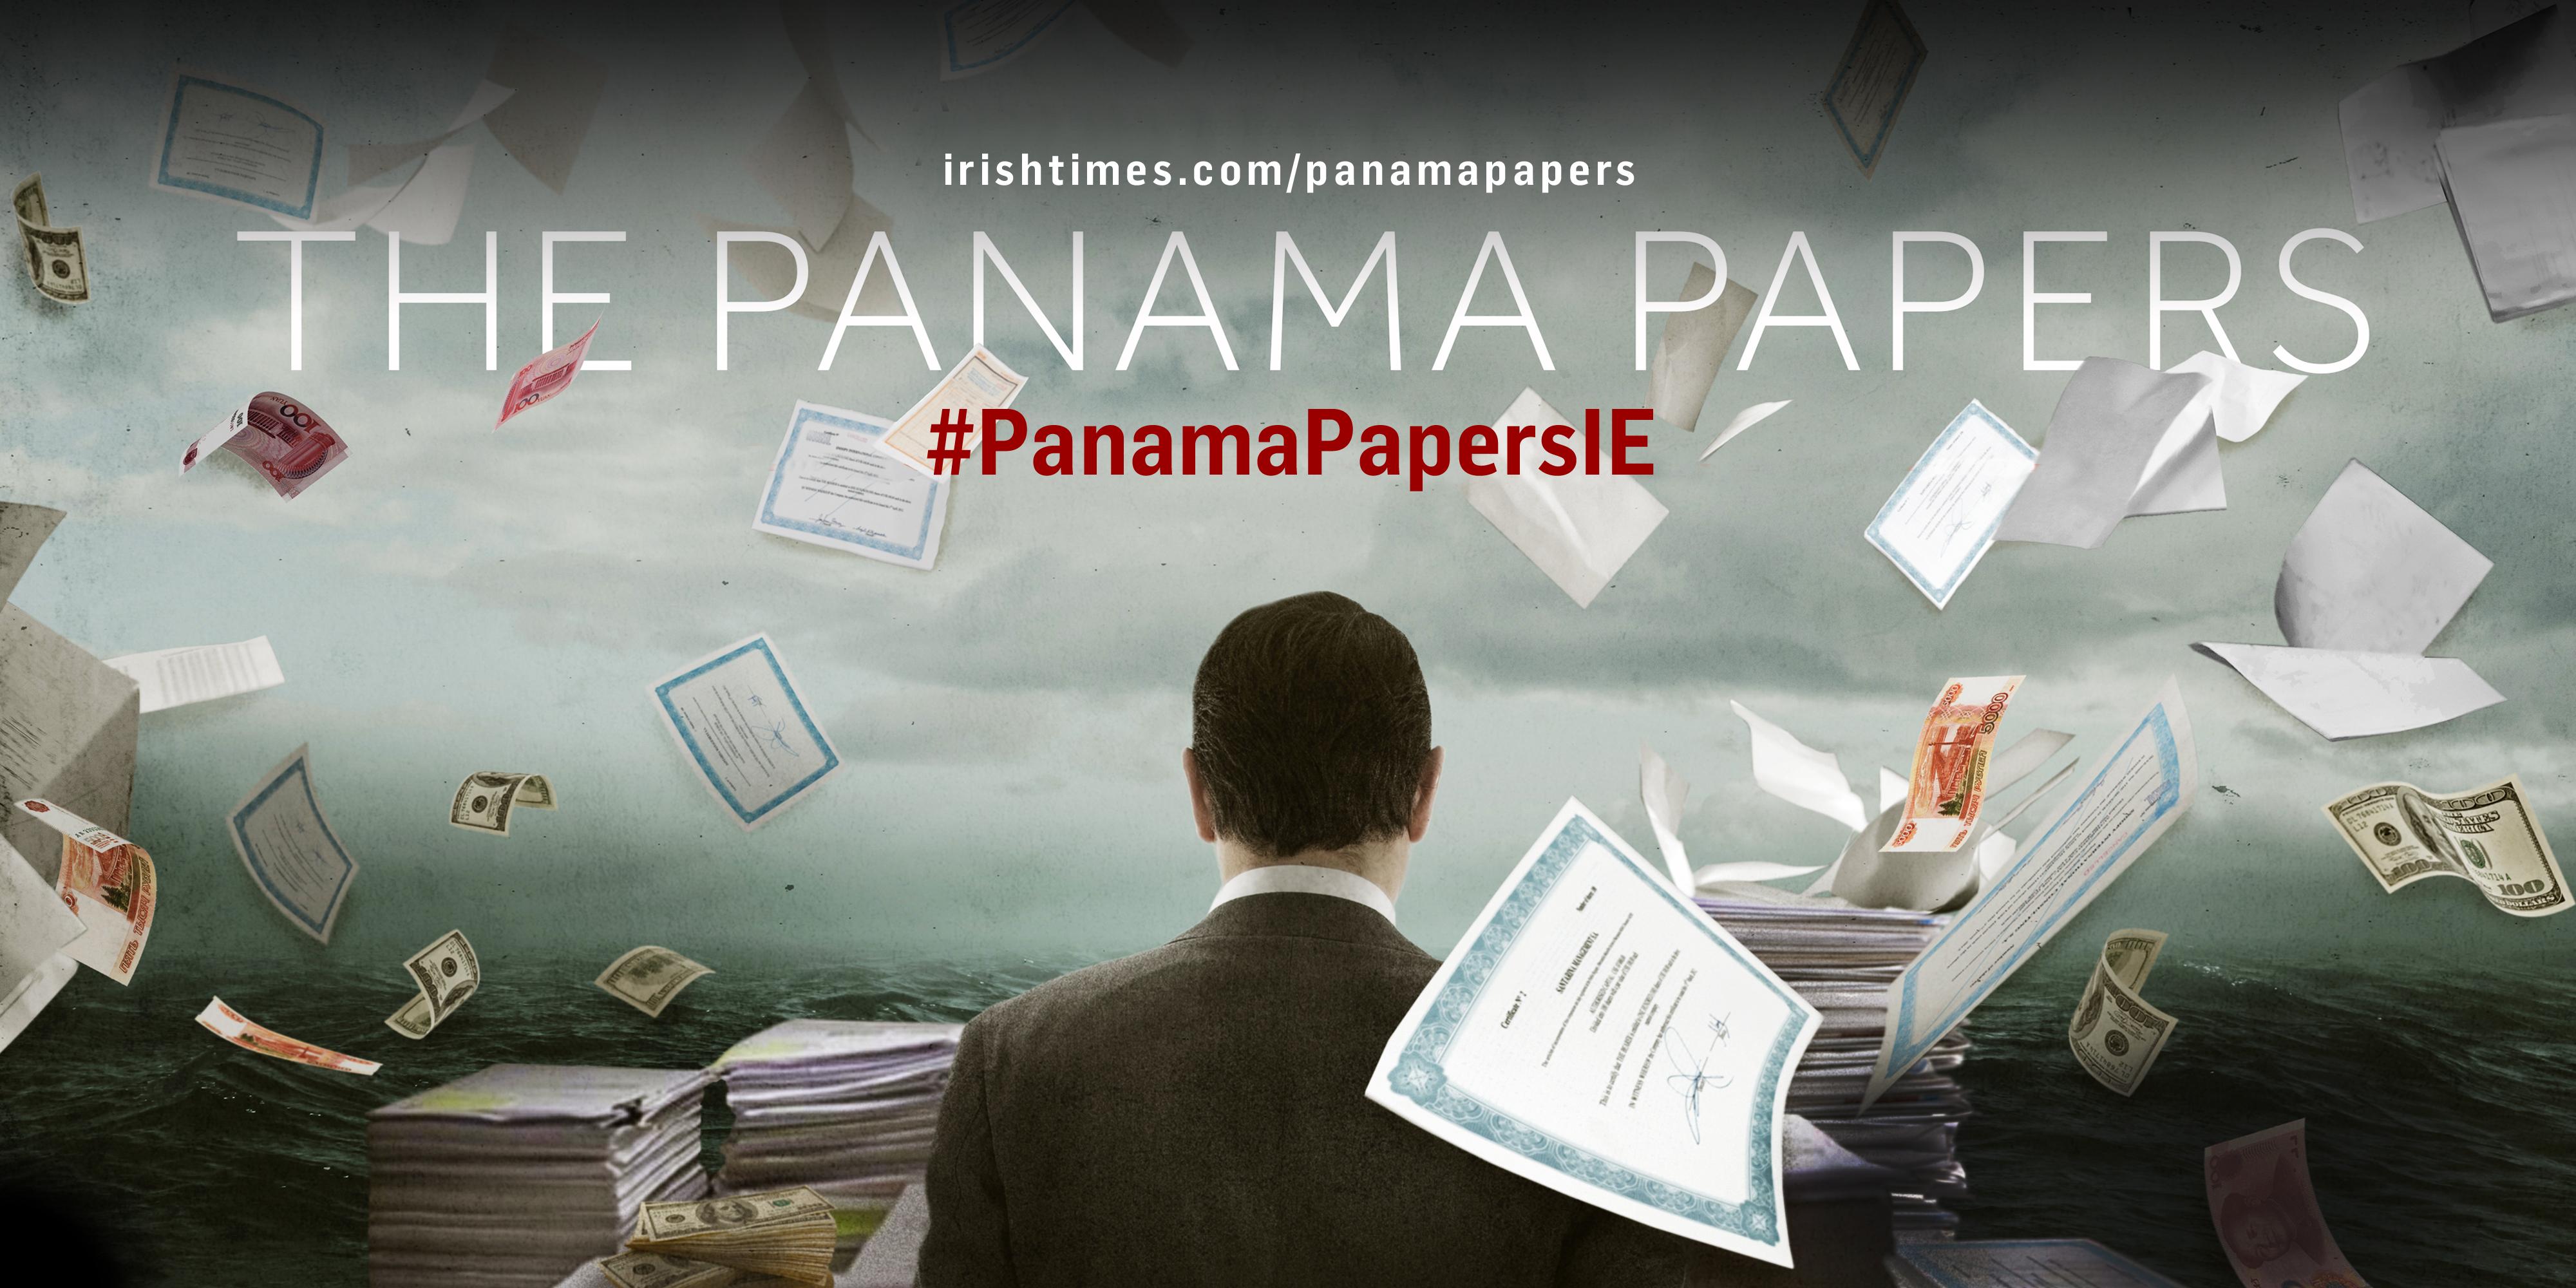 The panama